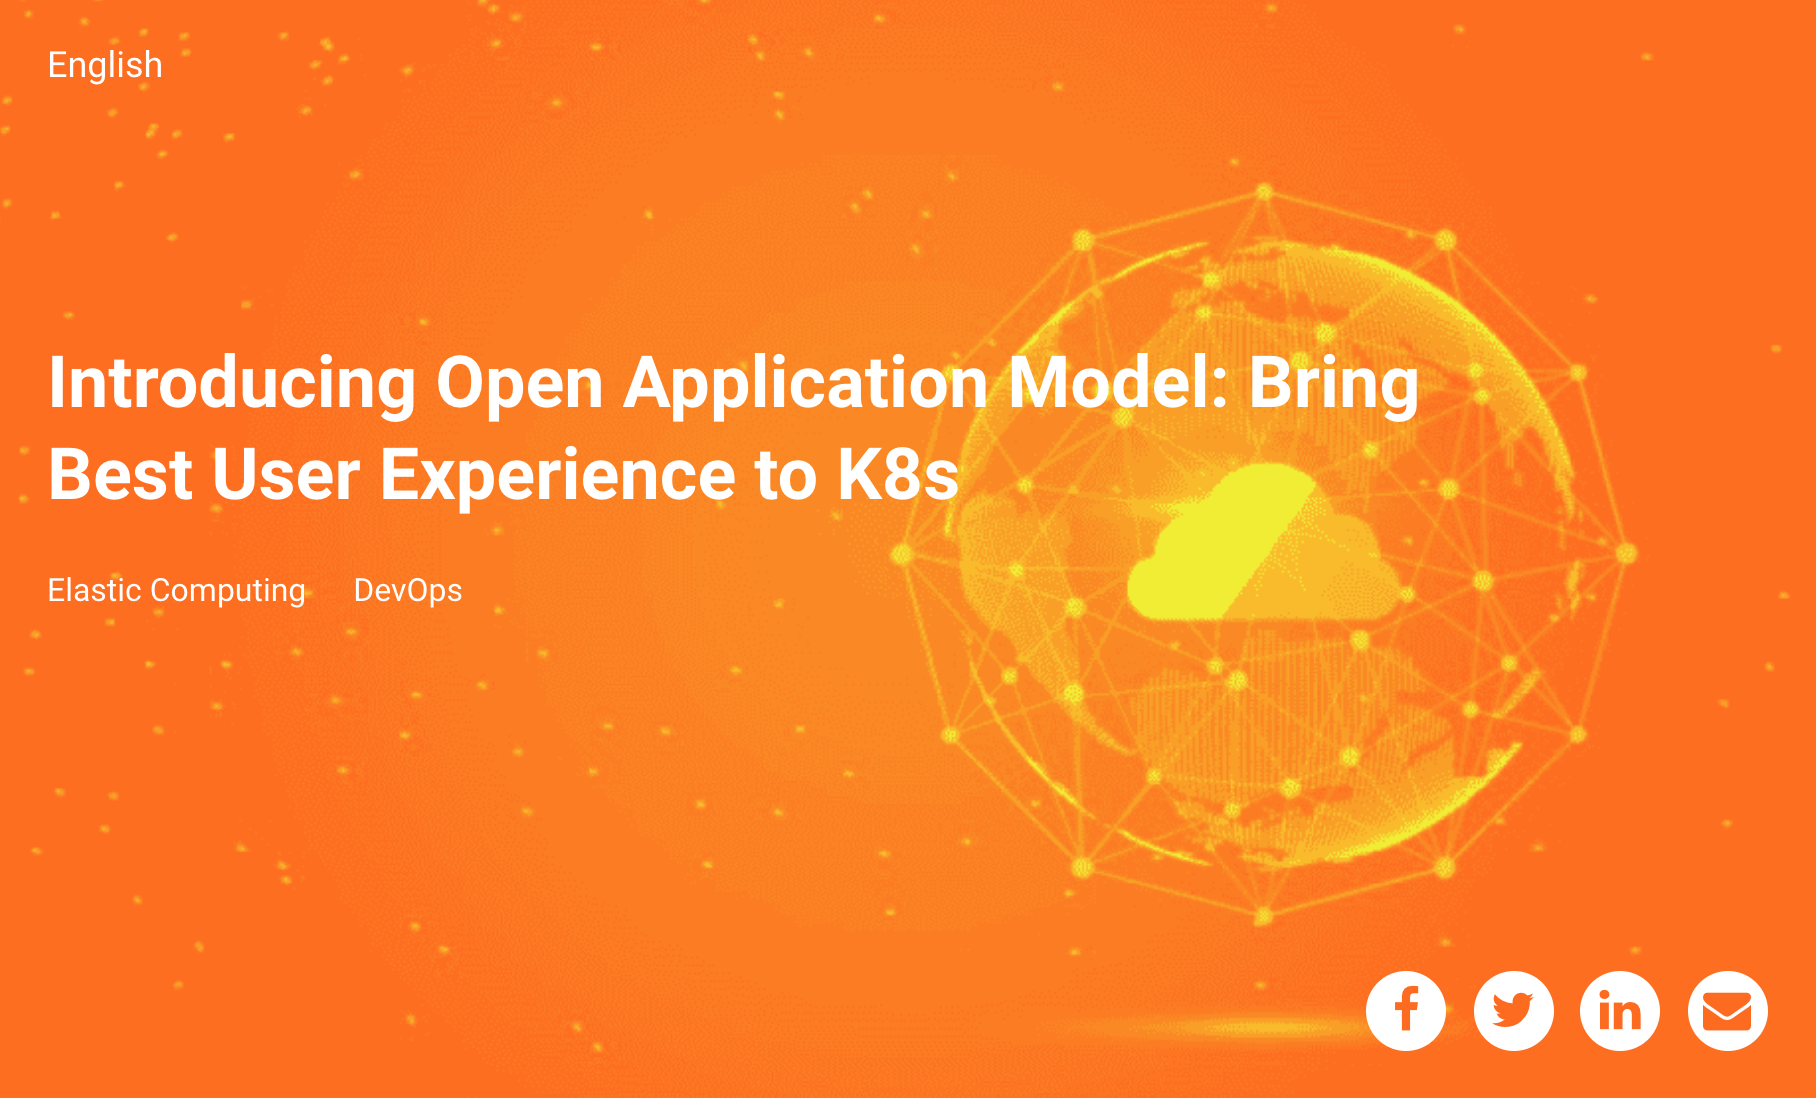 Alibaba Cloud Webinar: Introducing Open Application Model: Bring Best User Experience to K8s